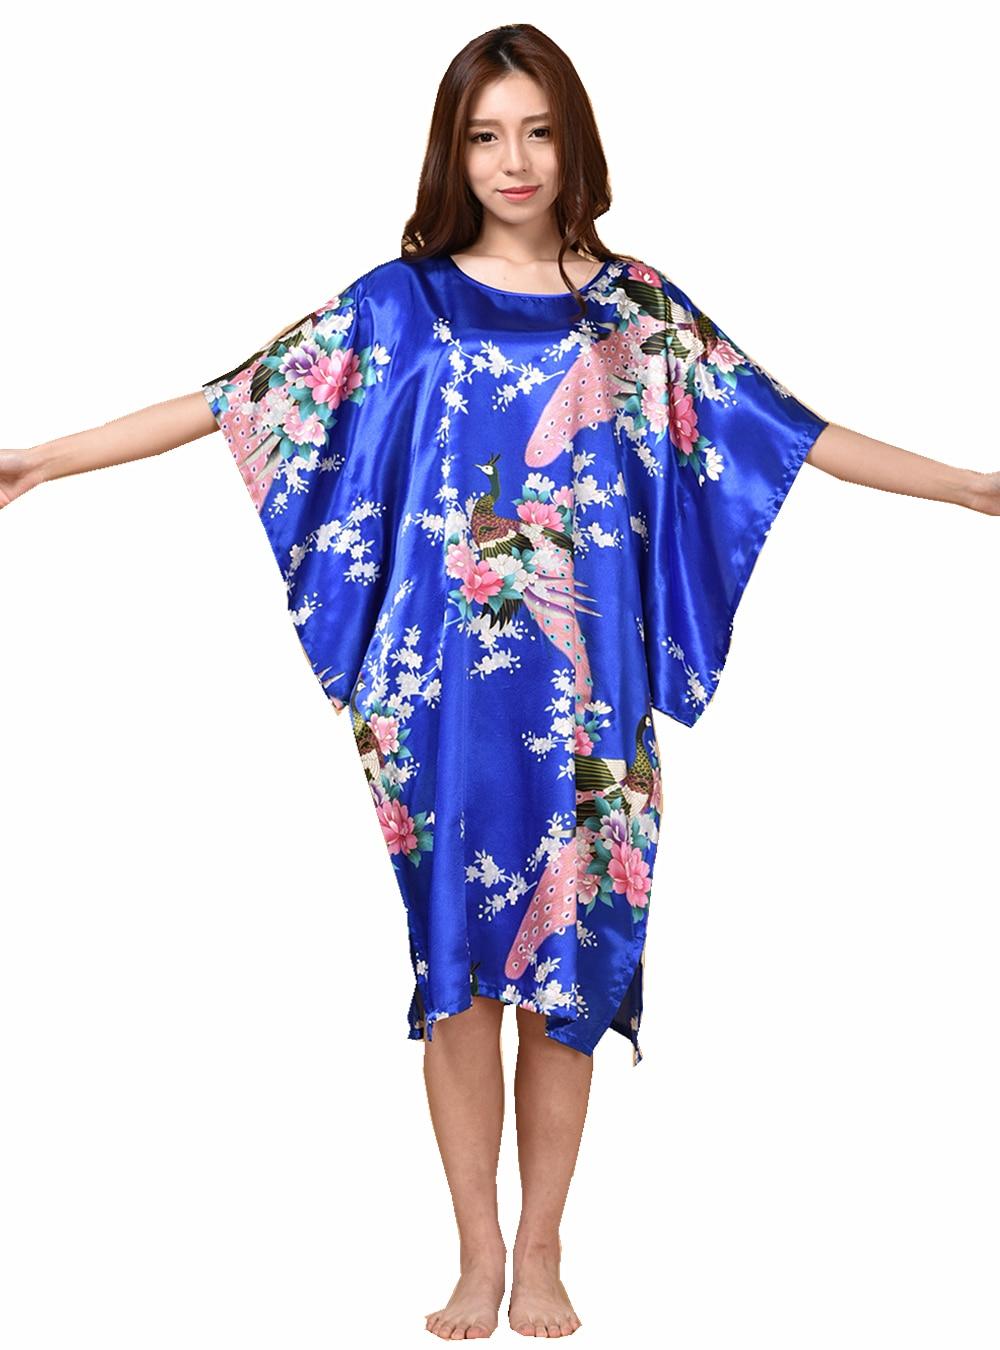 Plus Size Fashion Female Robe Bath Gown Printed Design Blue Women's Faux Silk Nightdress Summer Nightgown Pijama Muje TB07A